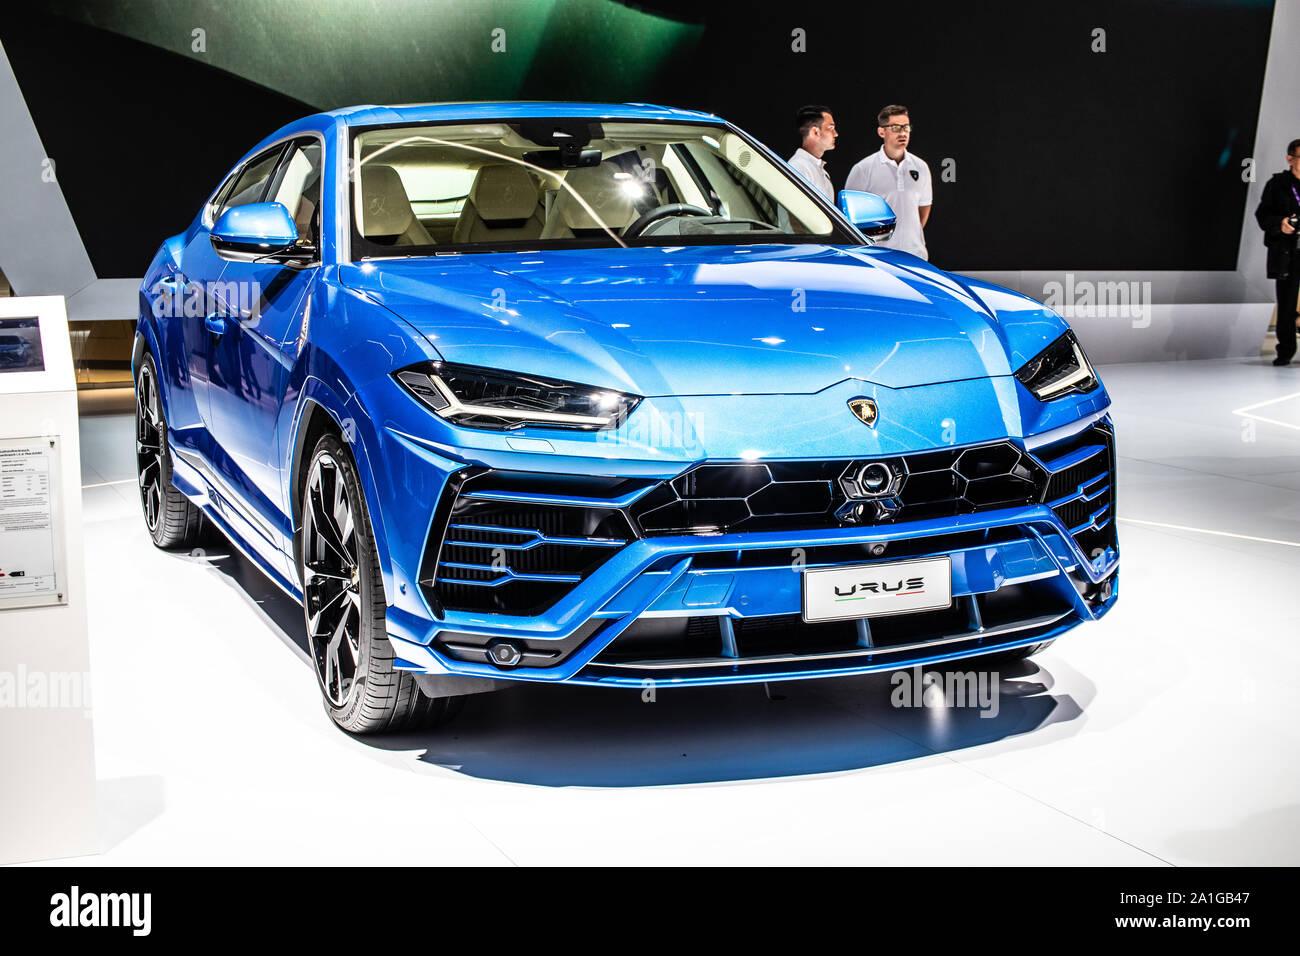 Frankfurt Germany Sep 10 2019 Metallic Blue Lamborghini